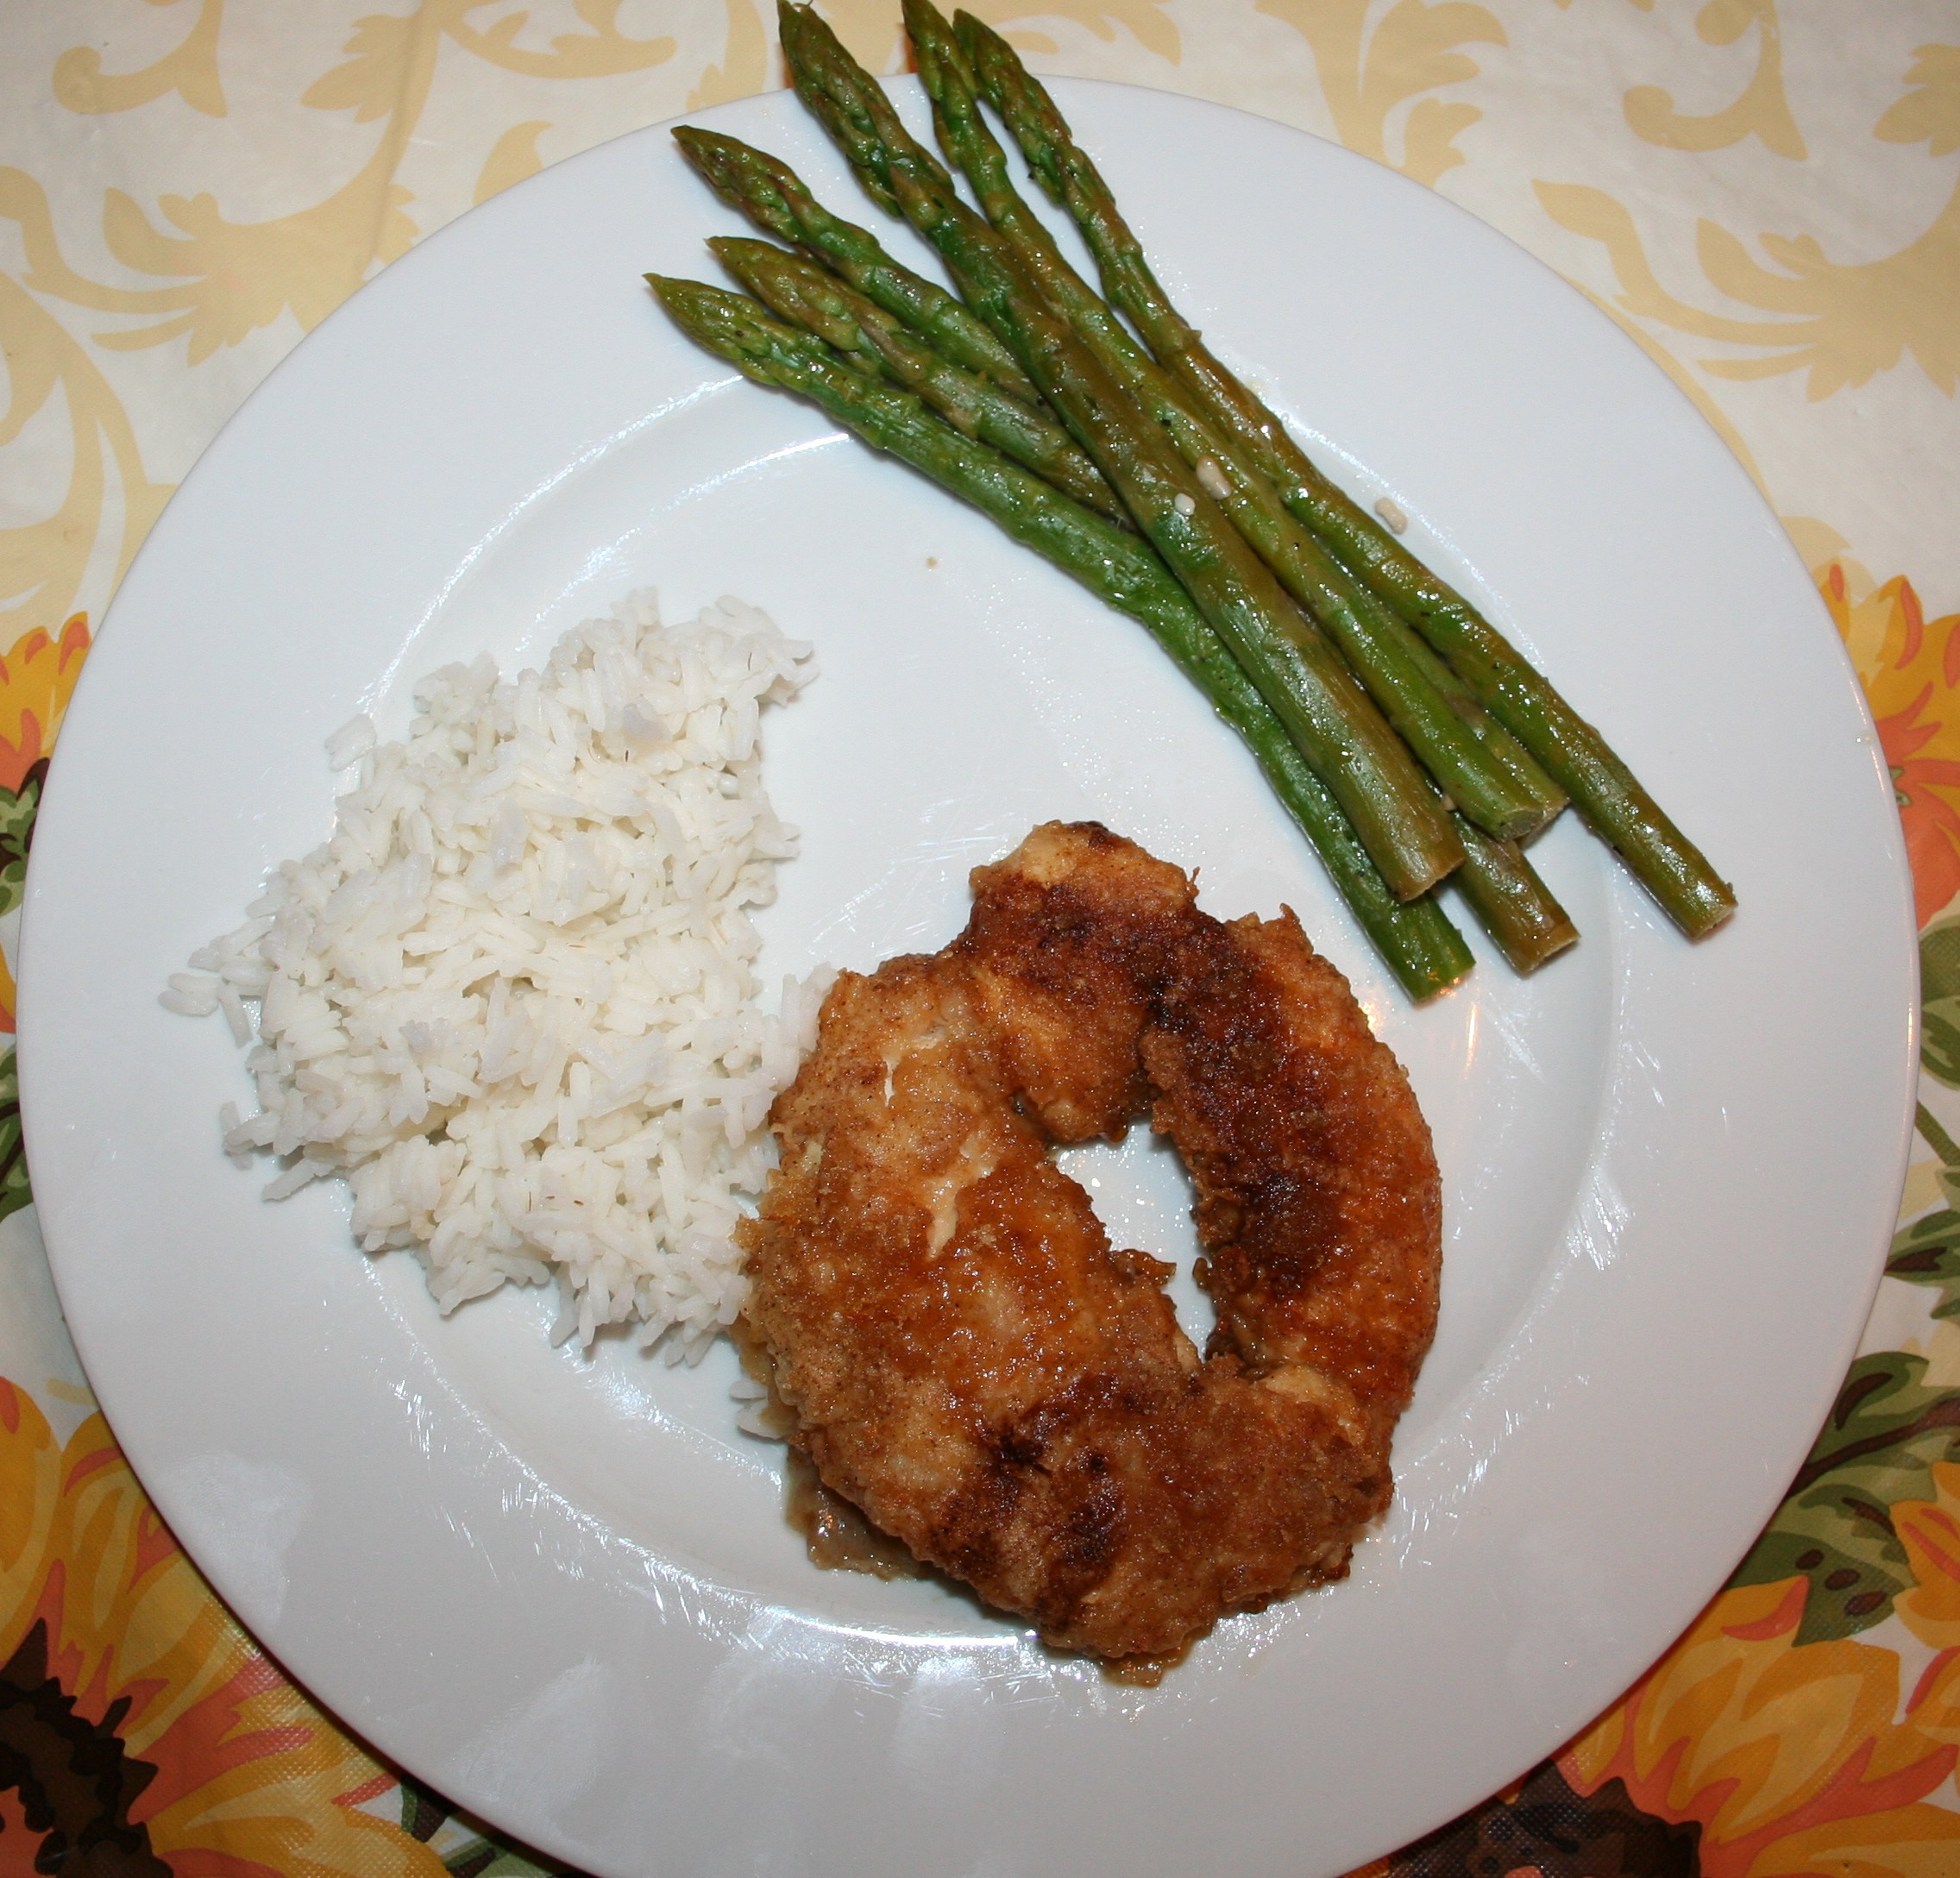 Lemon chicken recipe brown sugar